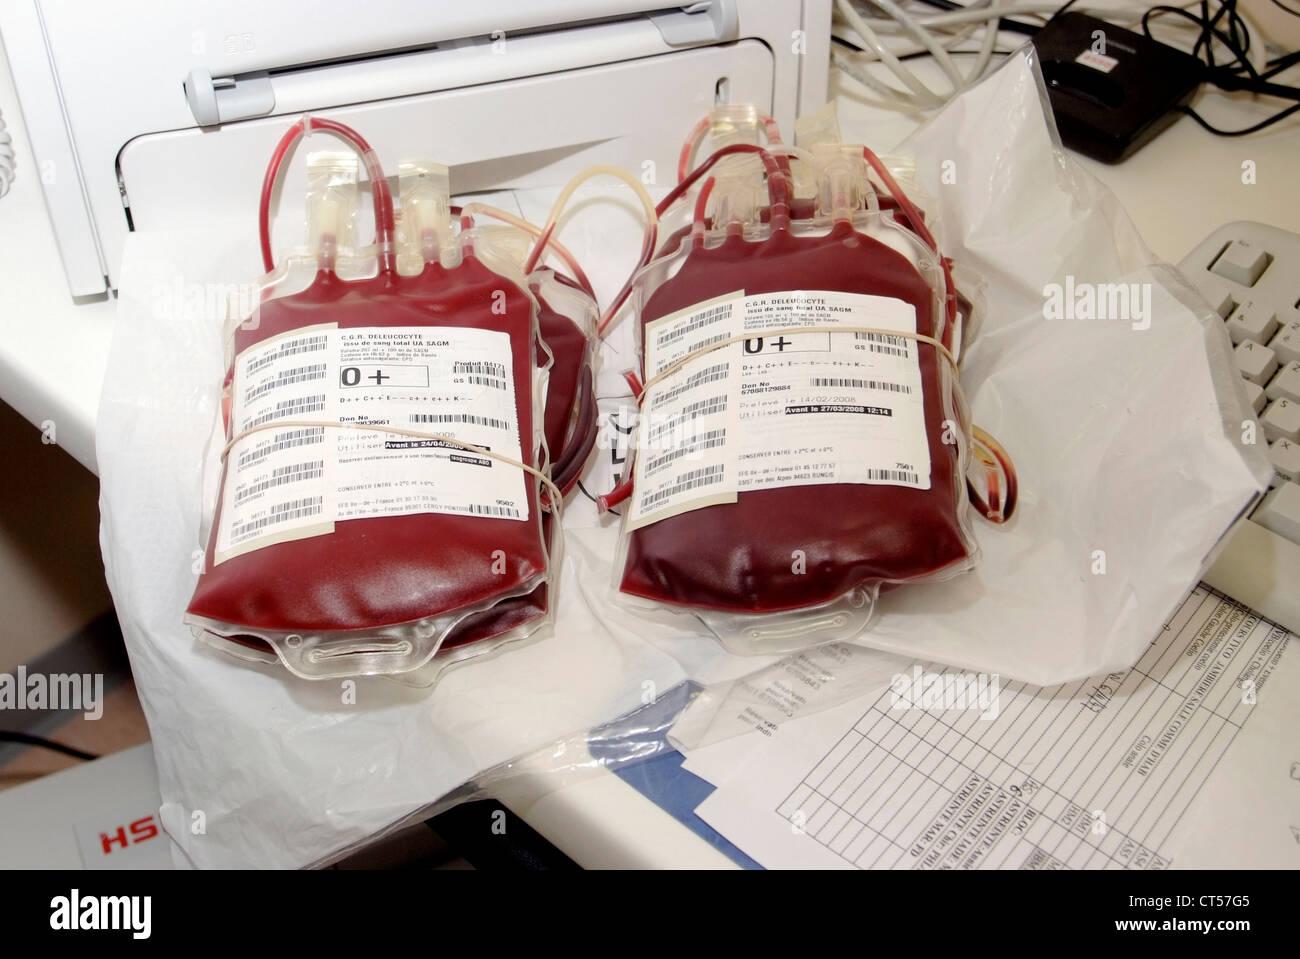 BLODD STOCK Stock Photo